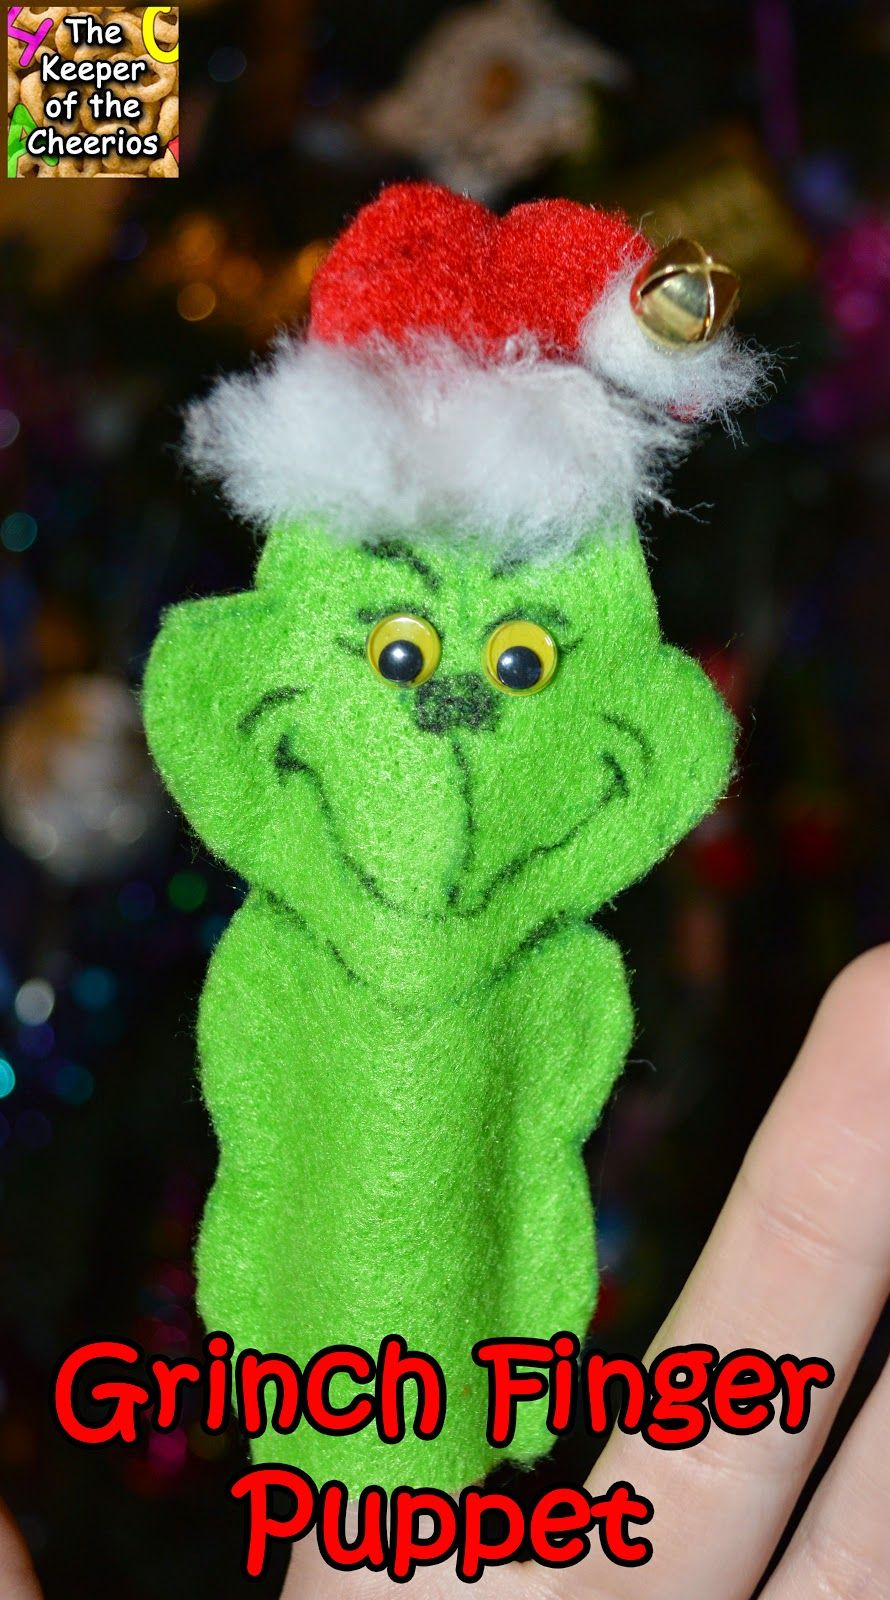 Grinch Finger Puppet Grinch Fingers Finger Puppets Grinch Decorations